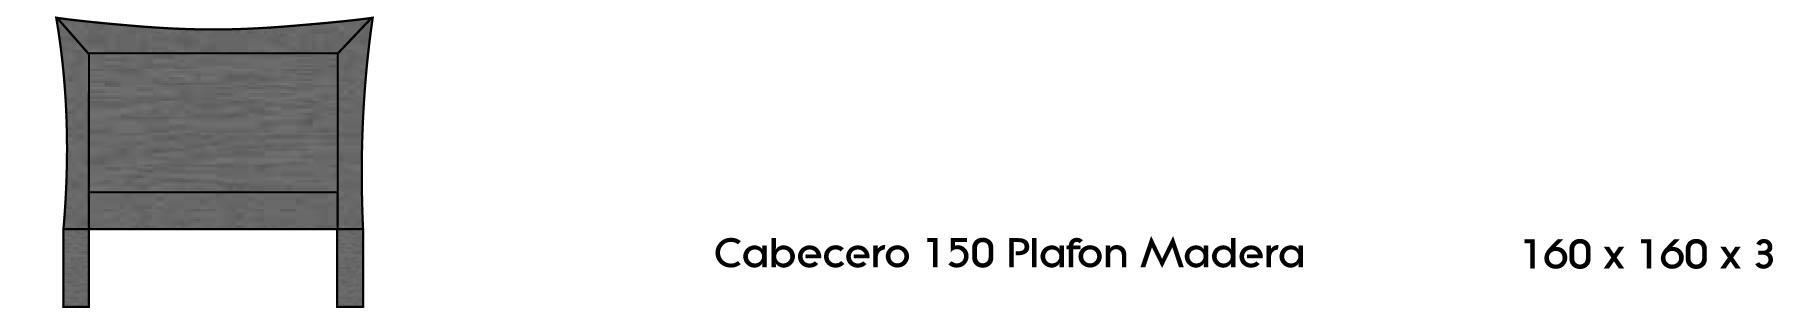 Cabecero 150 plafón